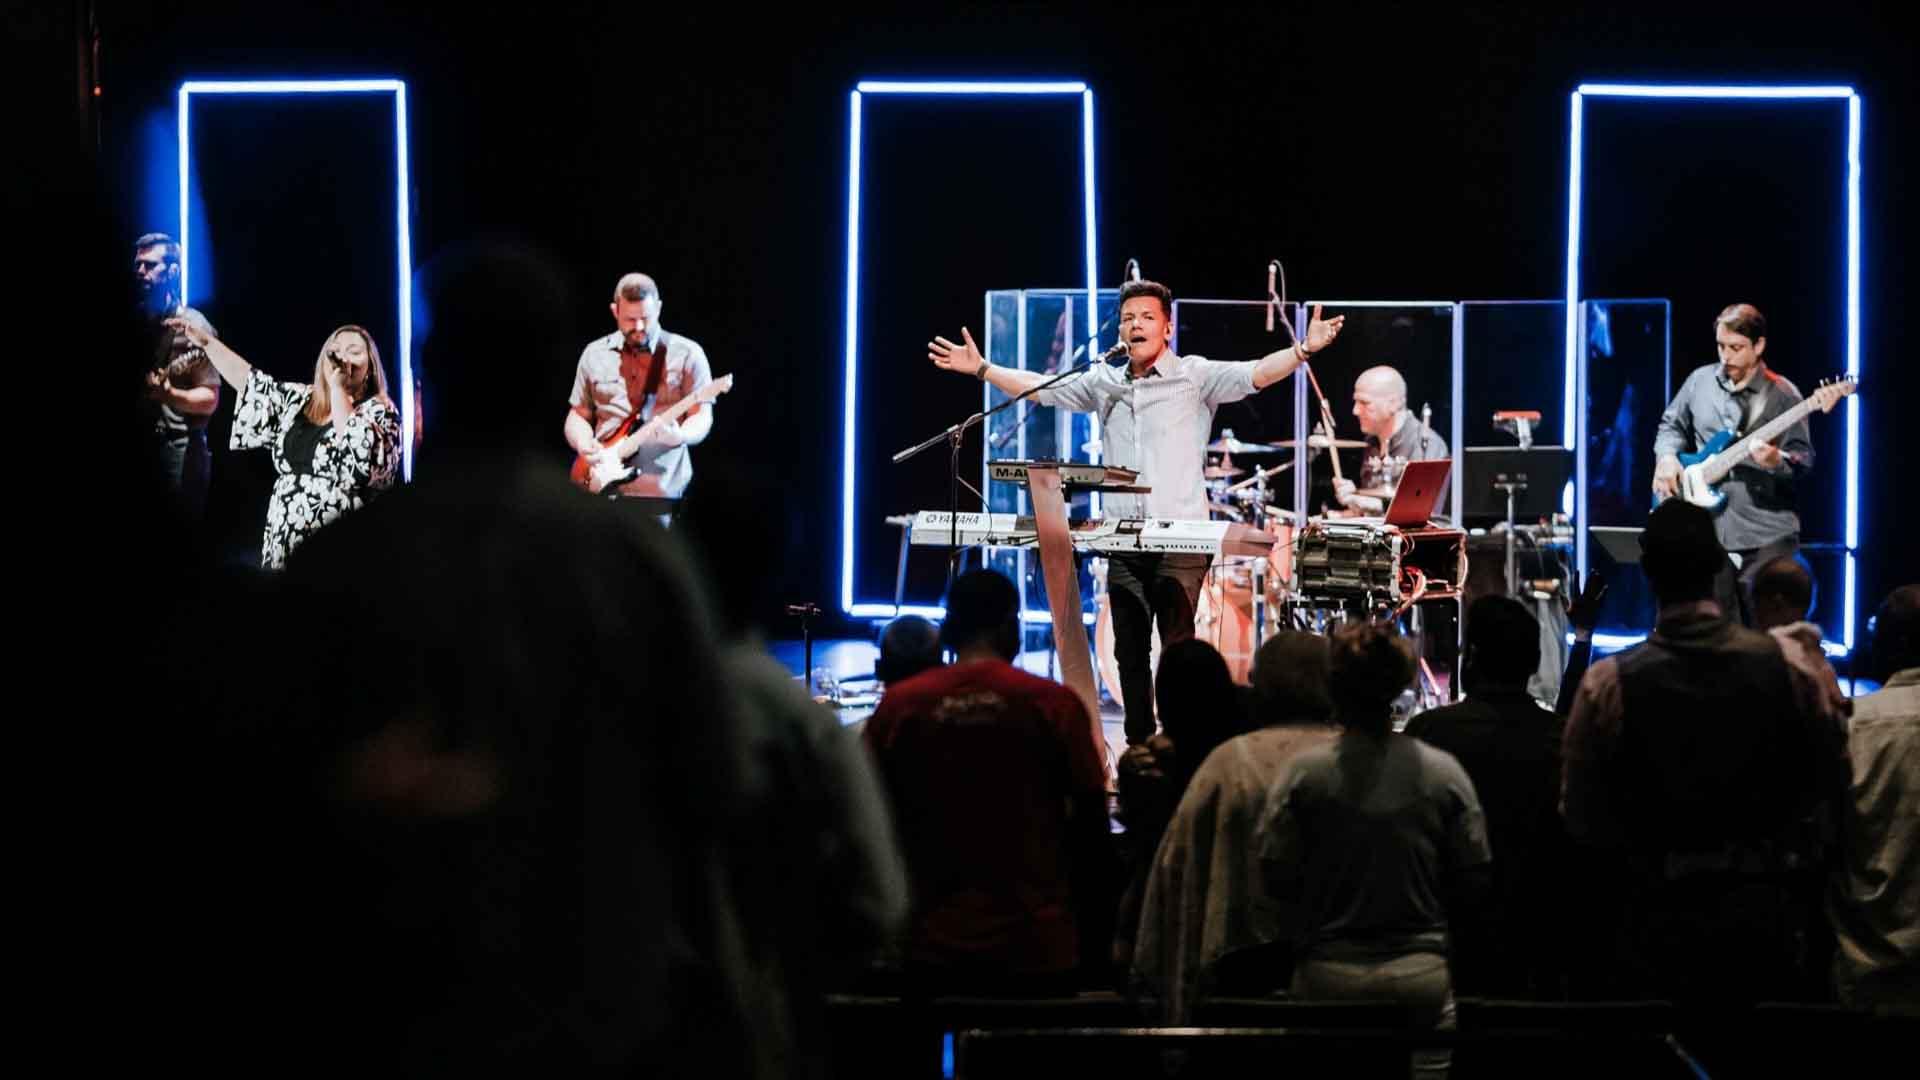 Mt Zion Church News - Band Playing Music